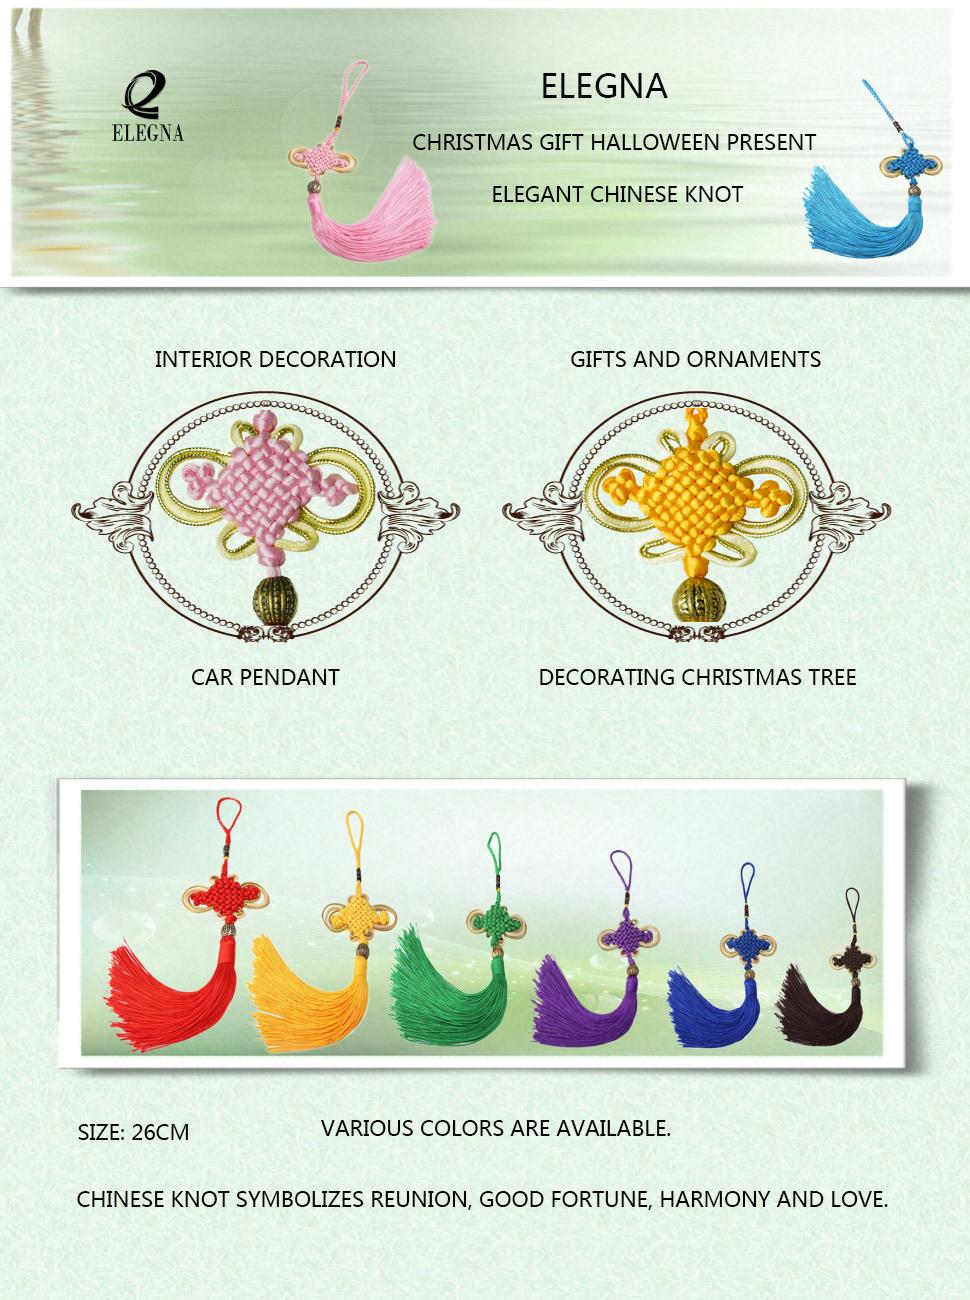 Amazon.com: ELEGNA Elegant Chinese Knot Christmas Gift Halloween ...